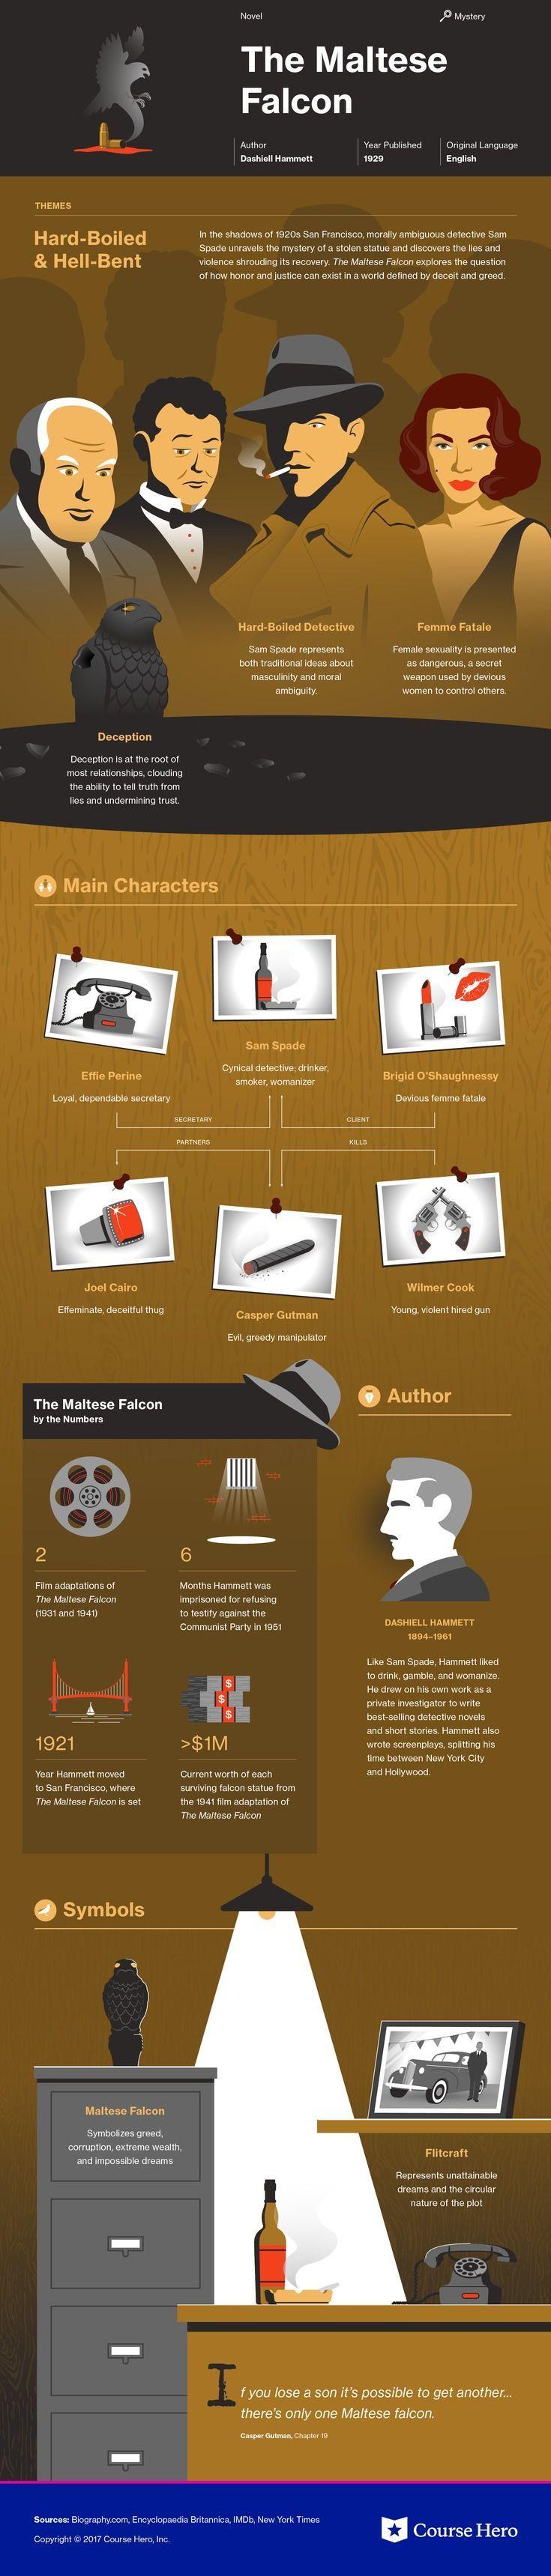 The Maltese Falcon Study Guide { baby you're so classic